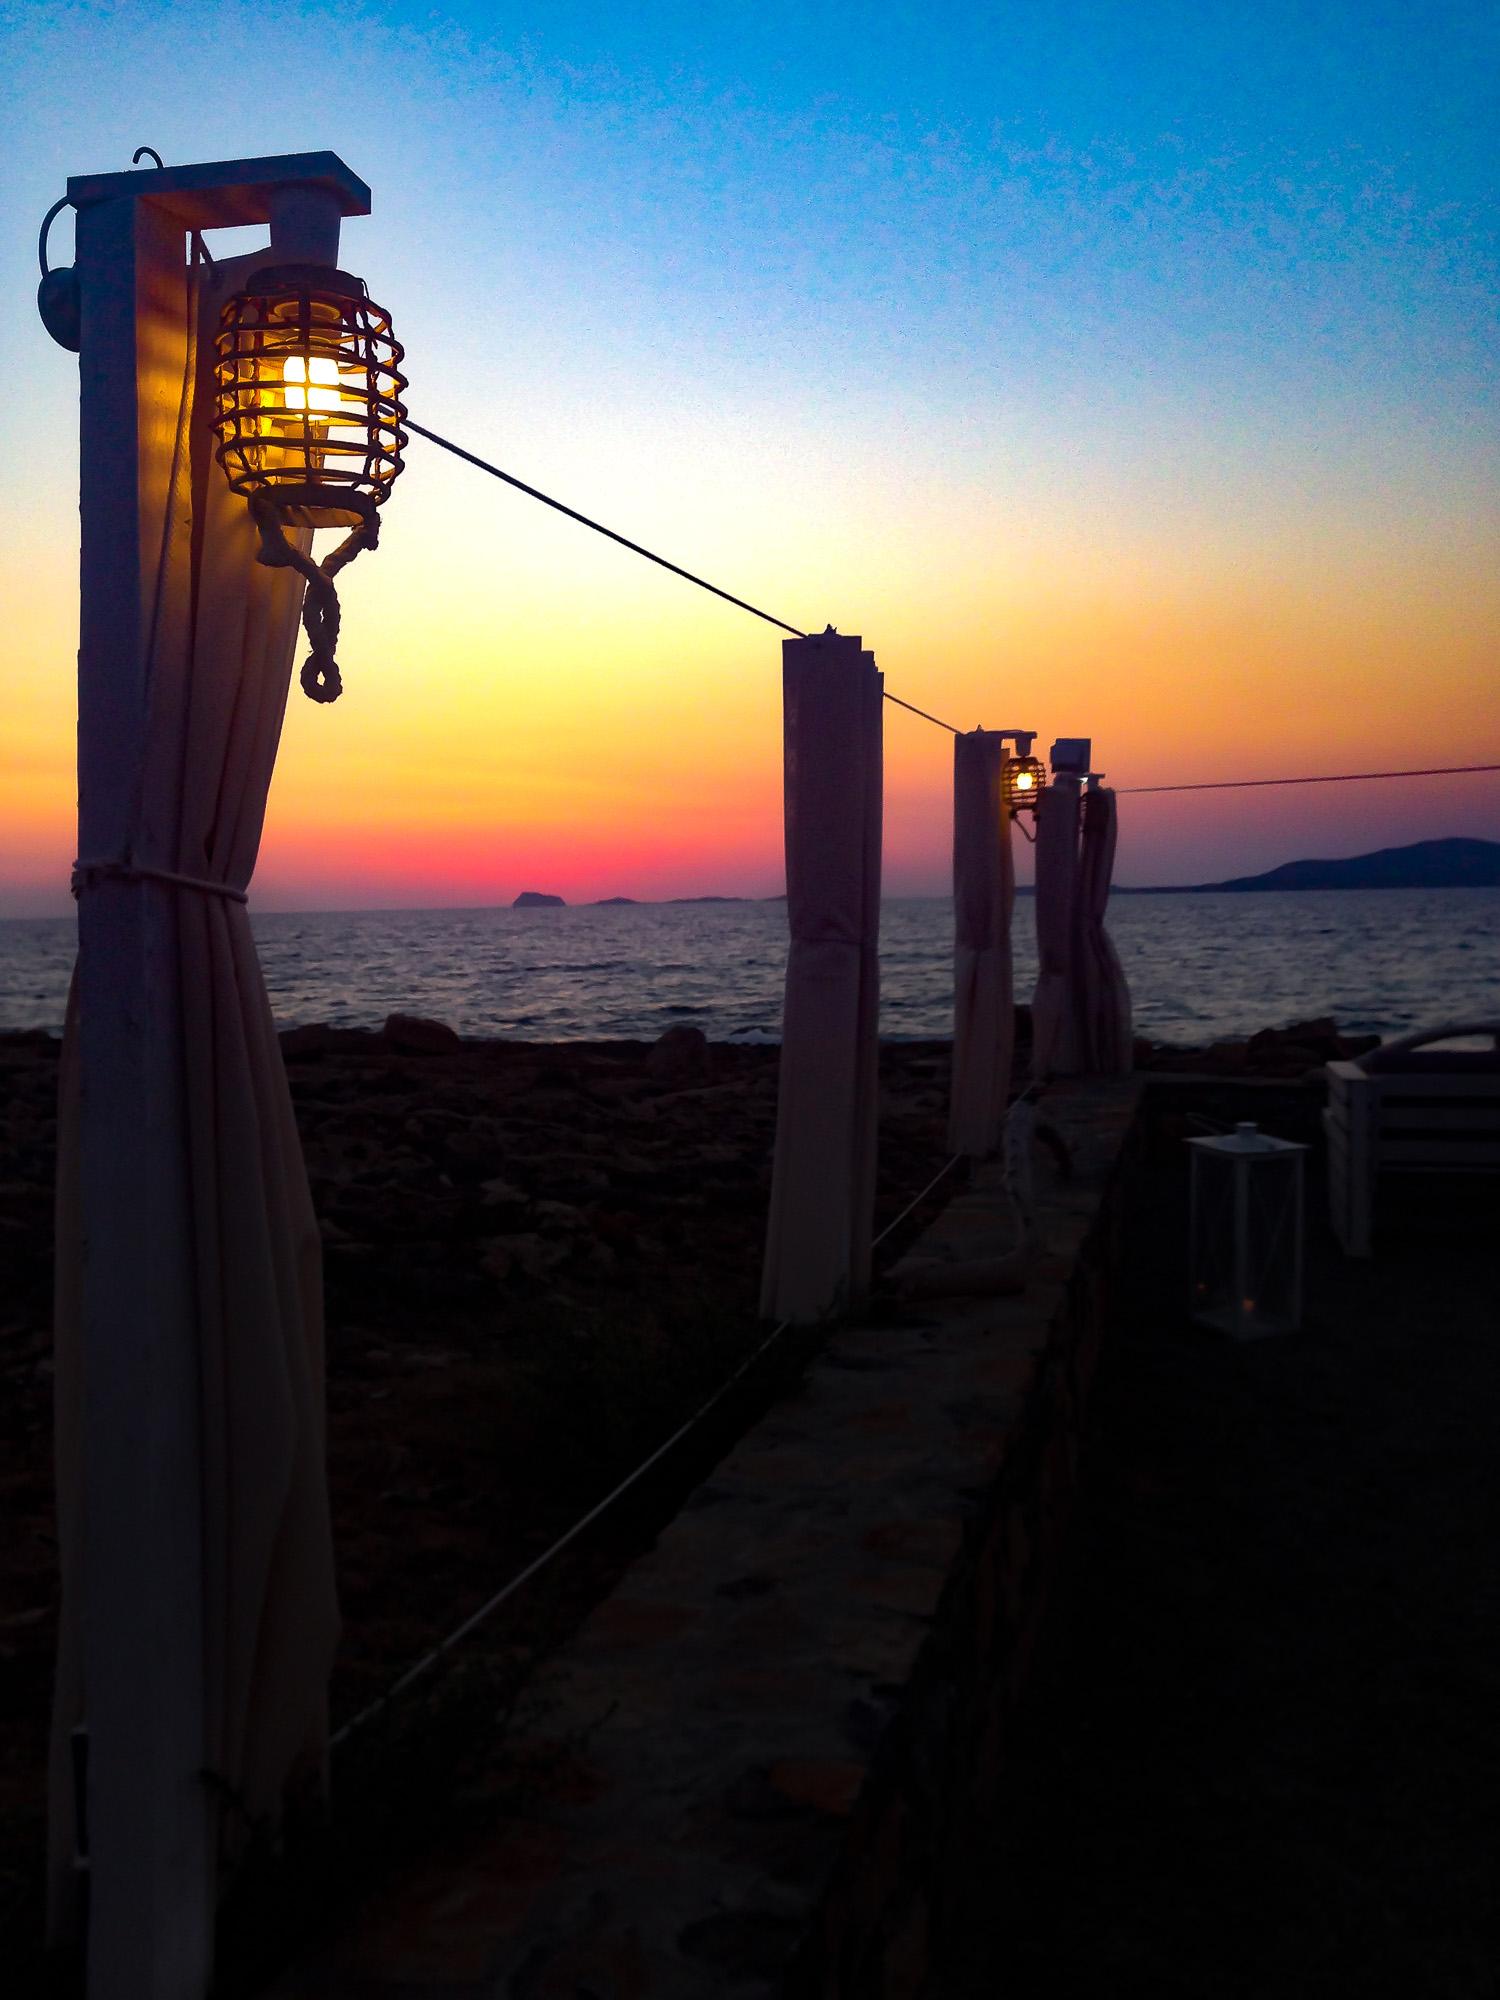 ammoua-kasos-greece-stemajourneys.com.jpg